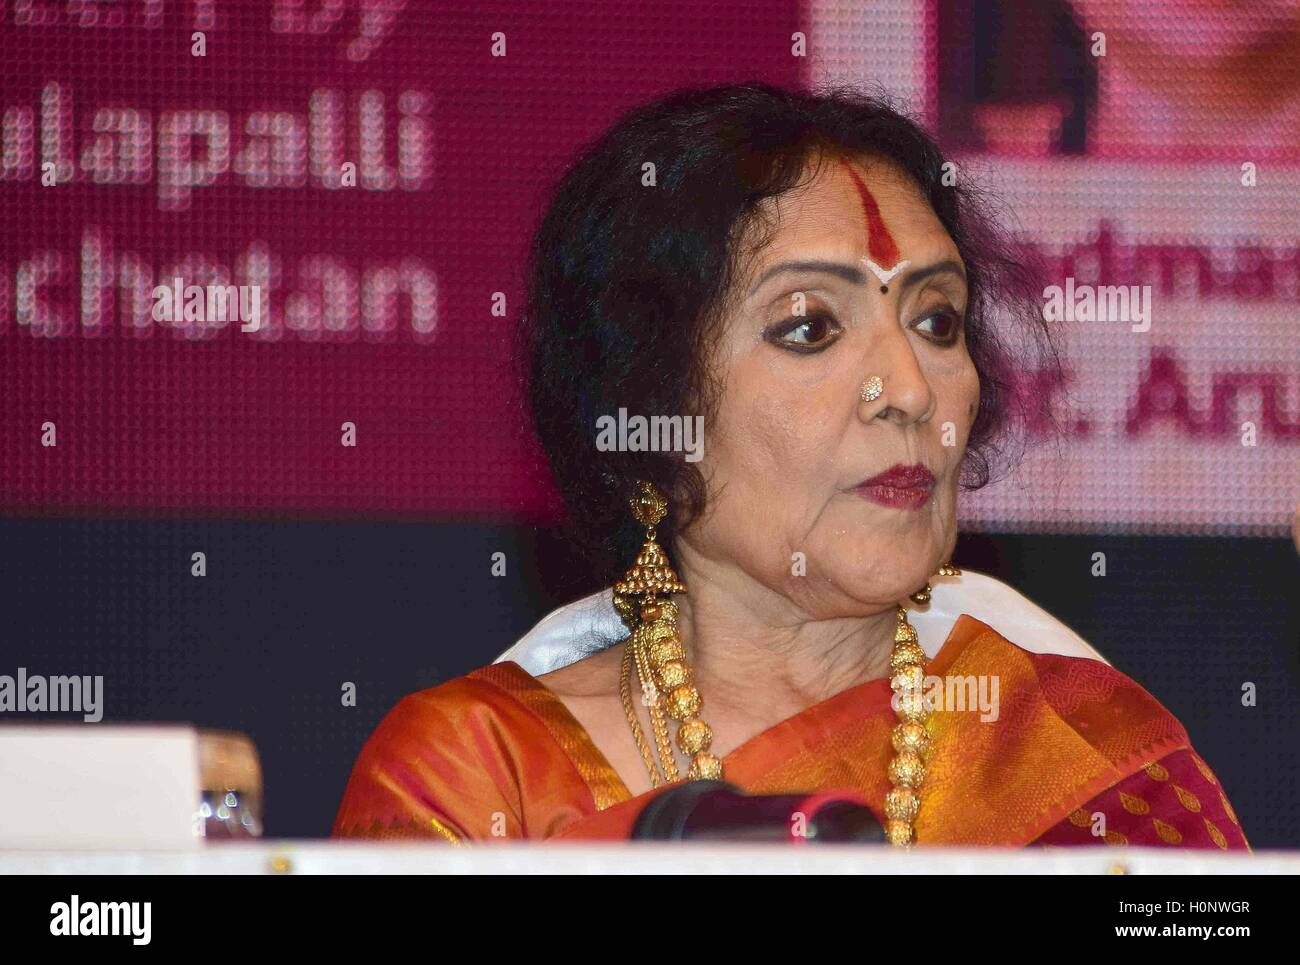 Carnatic Stock Photos & Carnatic Stock Images - Alamy